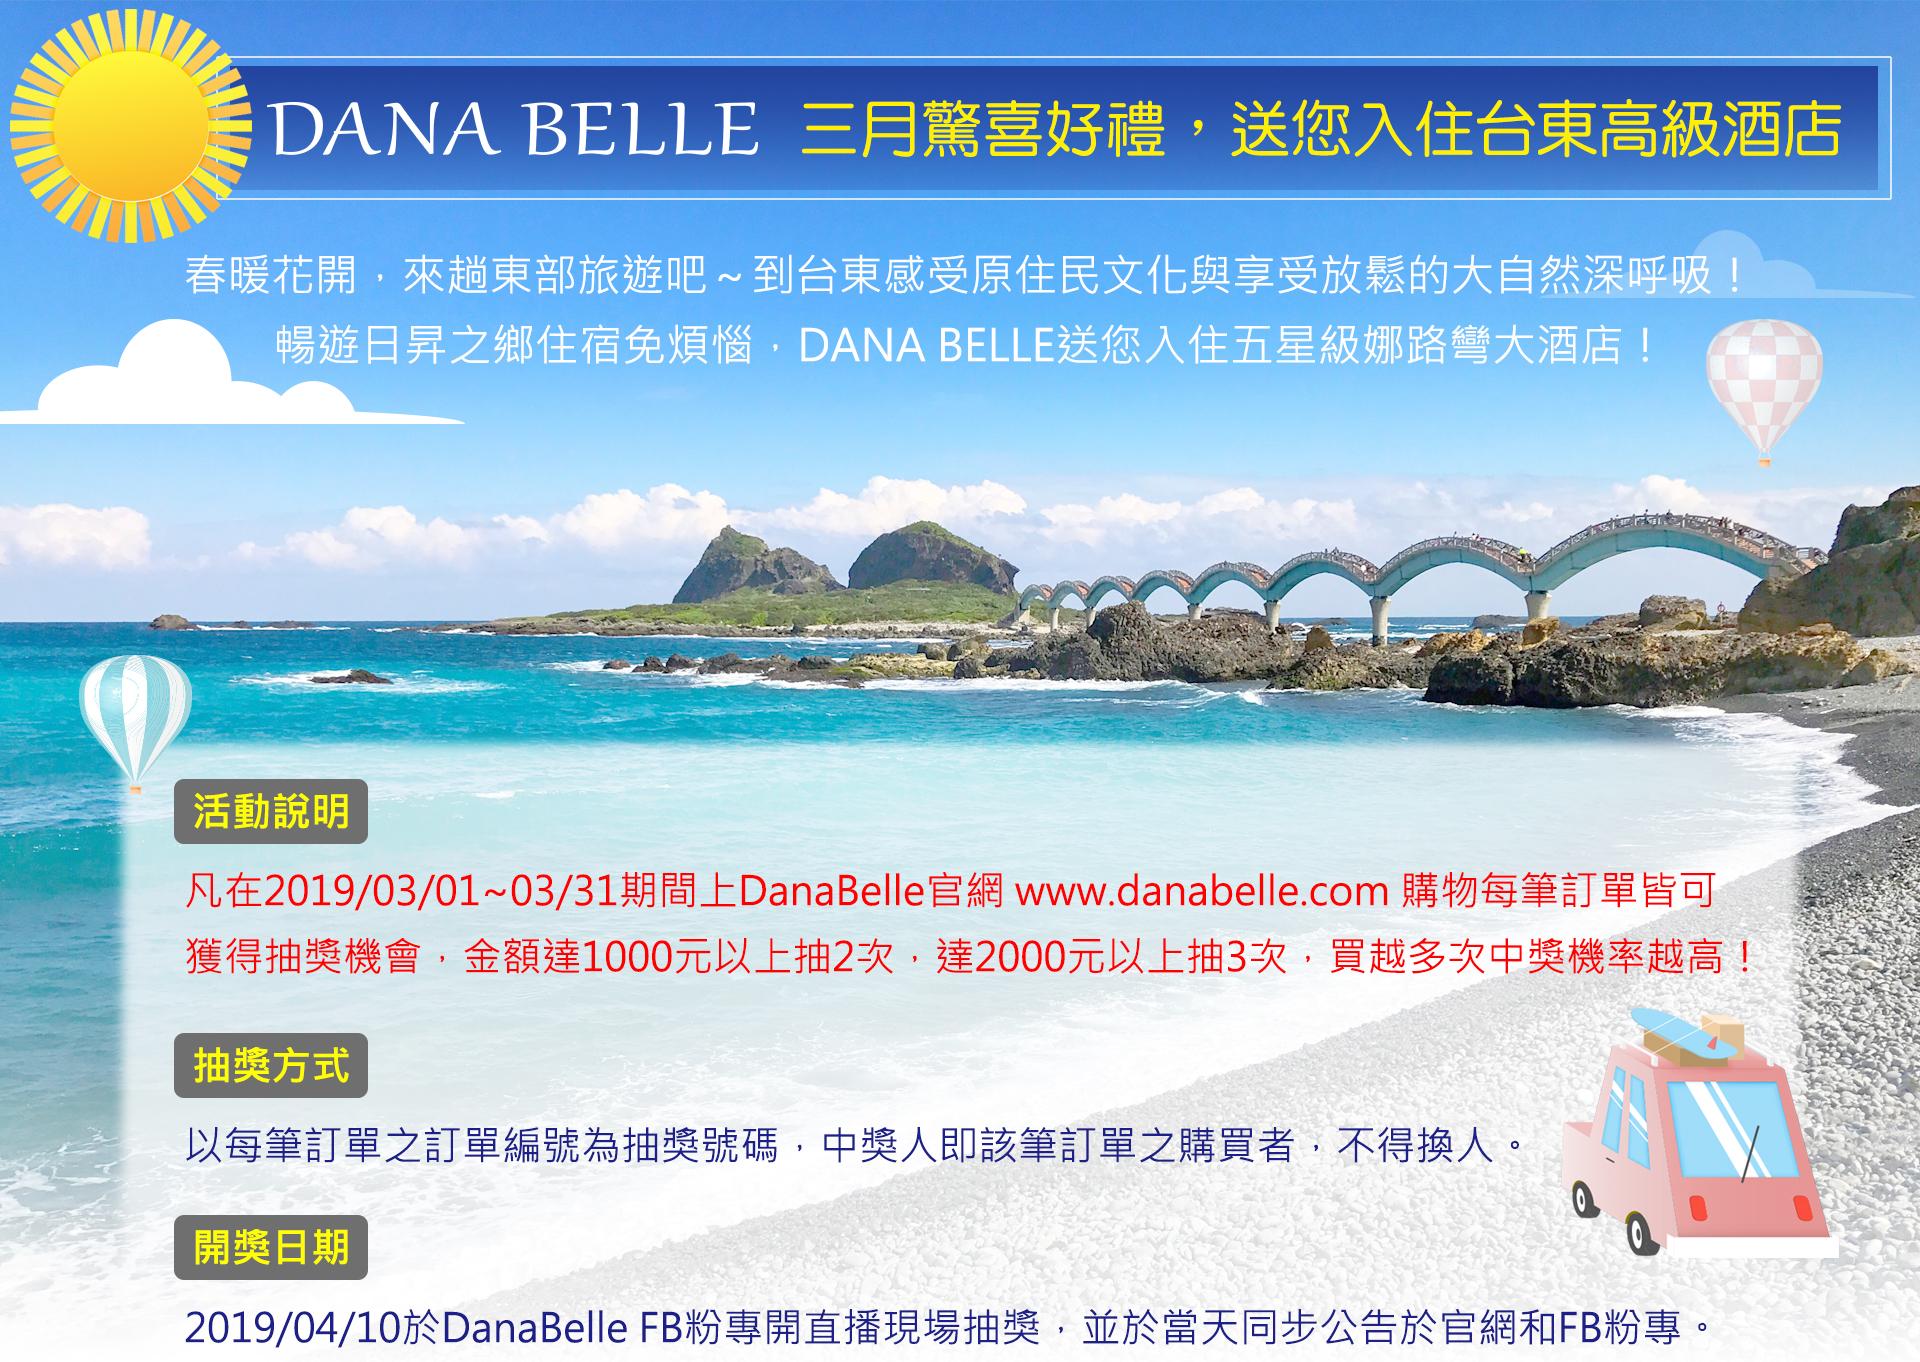 DANA BELLE 三月驚喜好禮,送您入住台東高級酒店